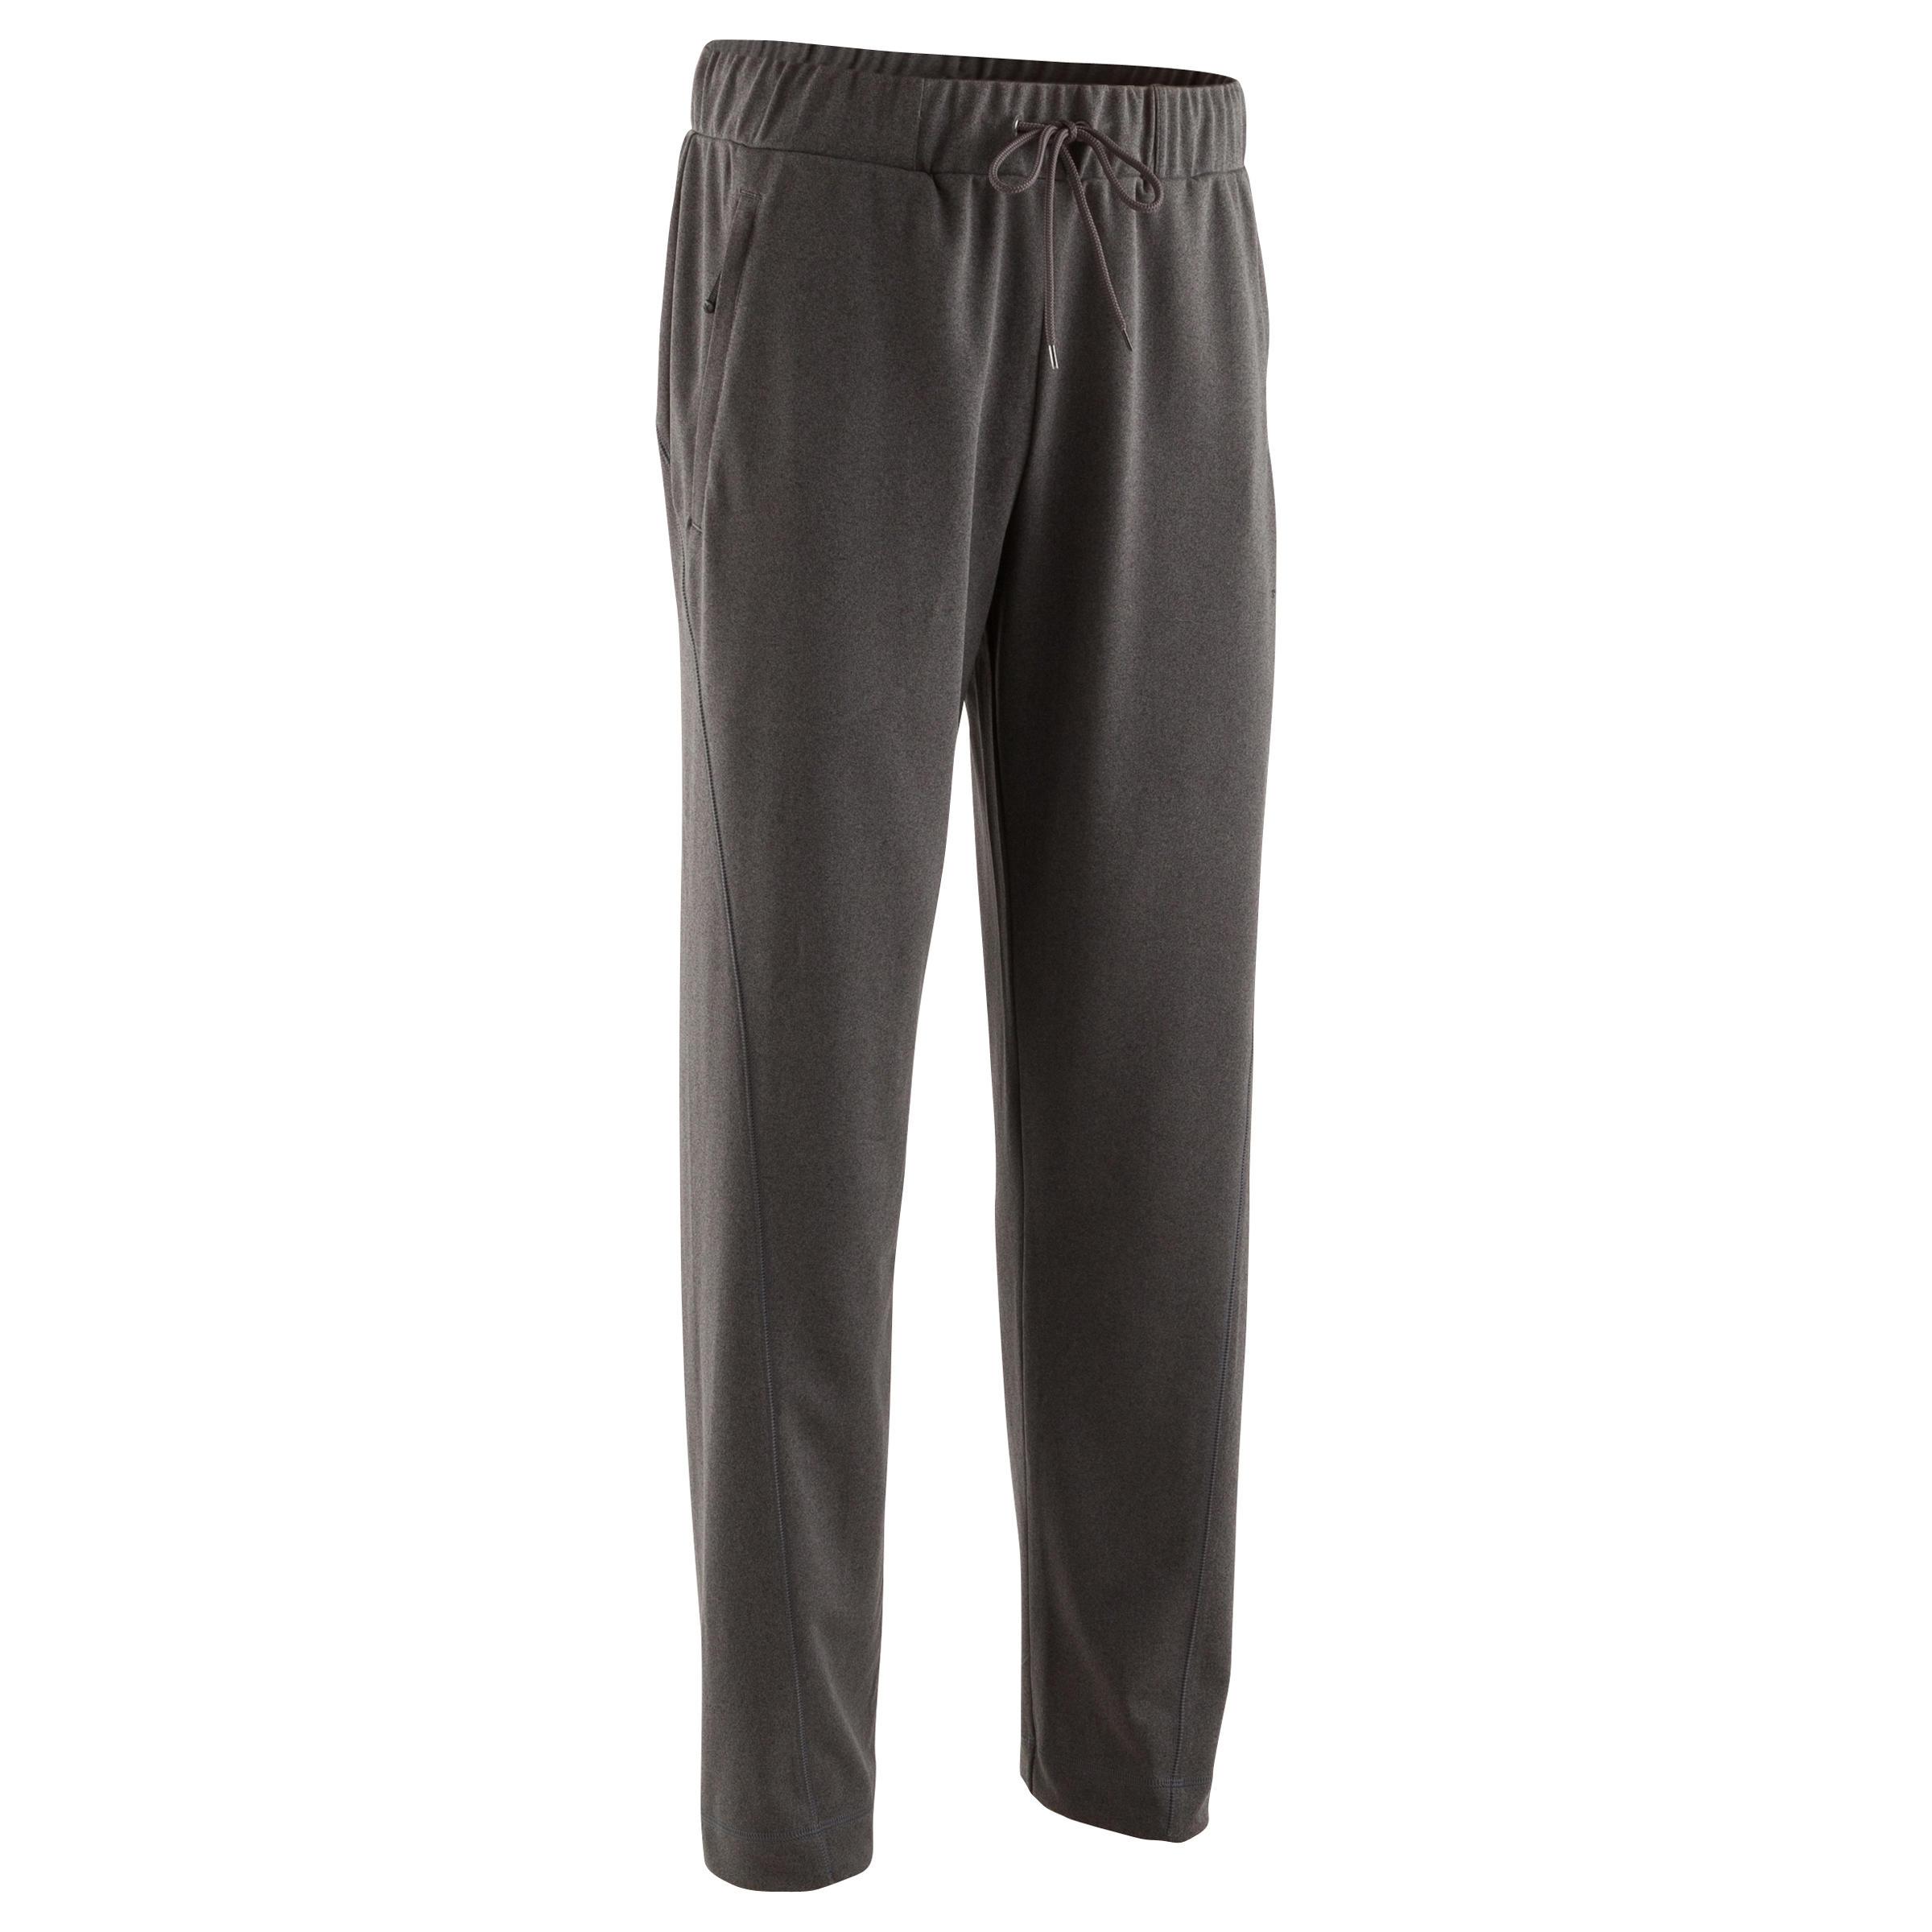 Pantalon yoga+ 900 homme gris